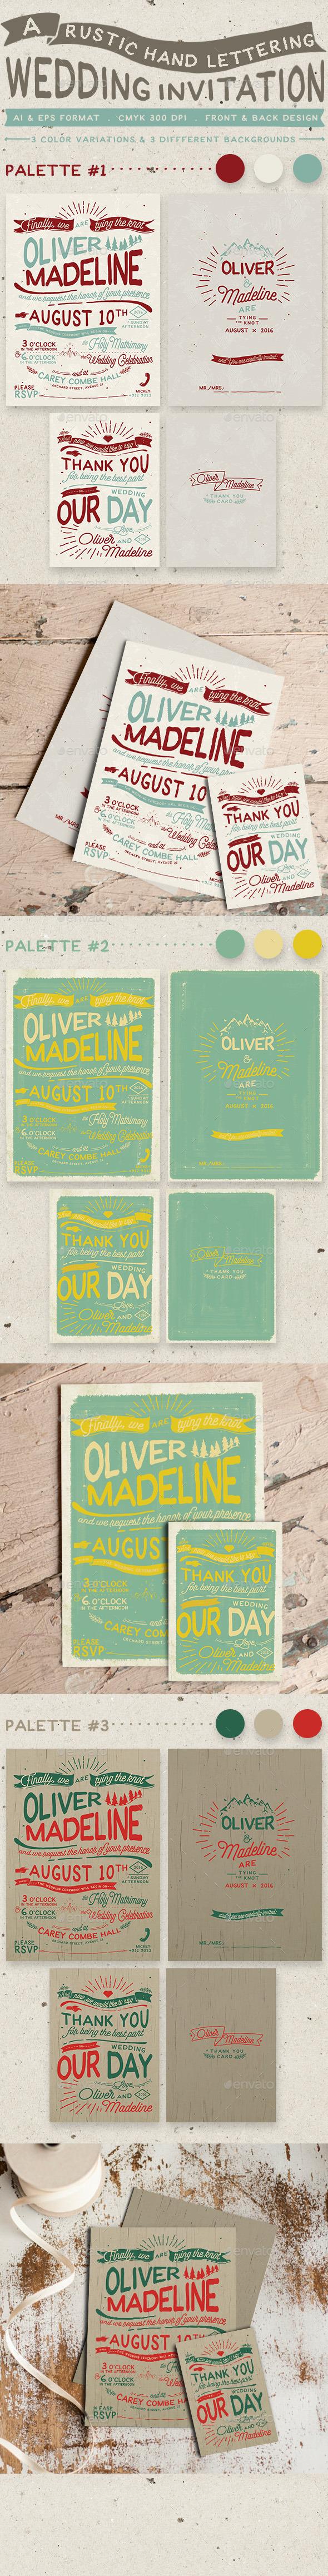 Rustic Hand Lettering Wedding Invitation - Weddings Cards & Invites